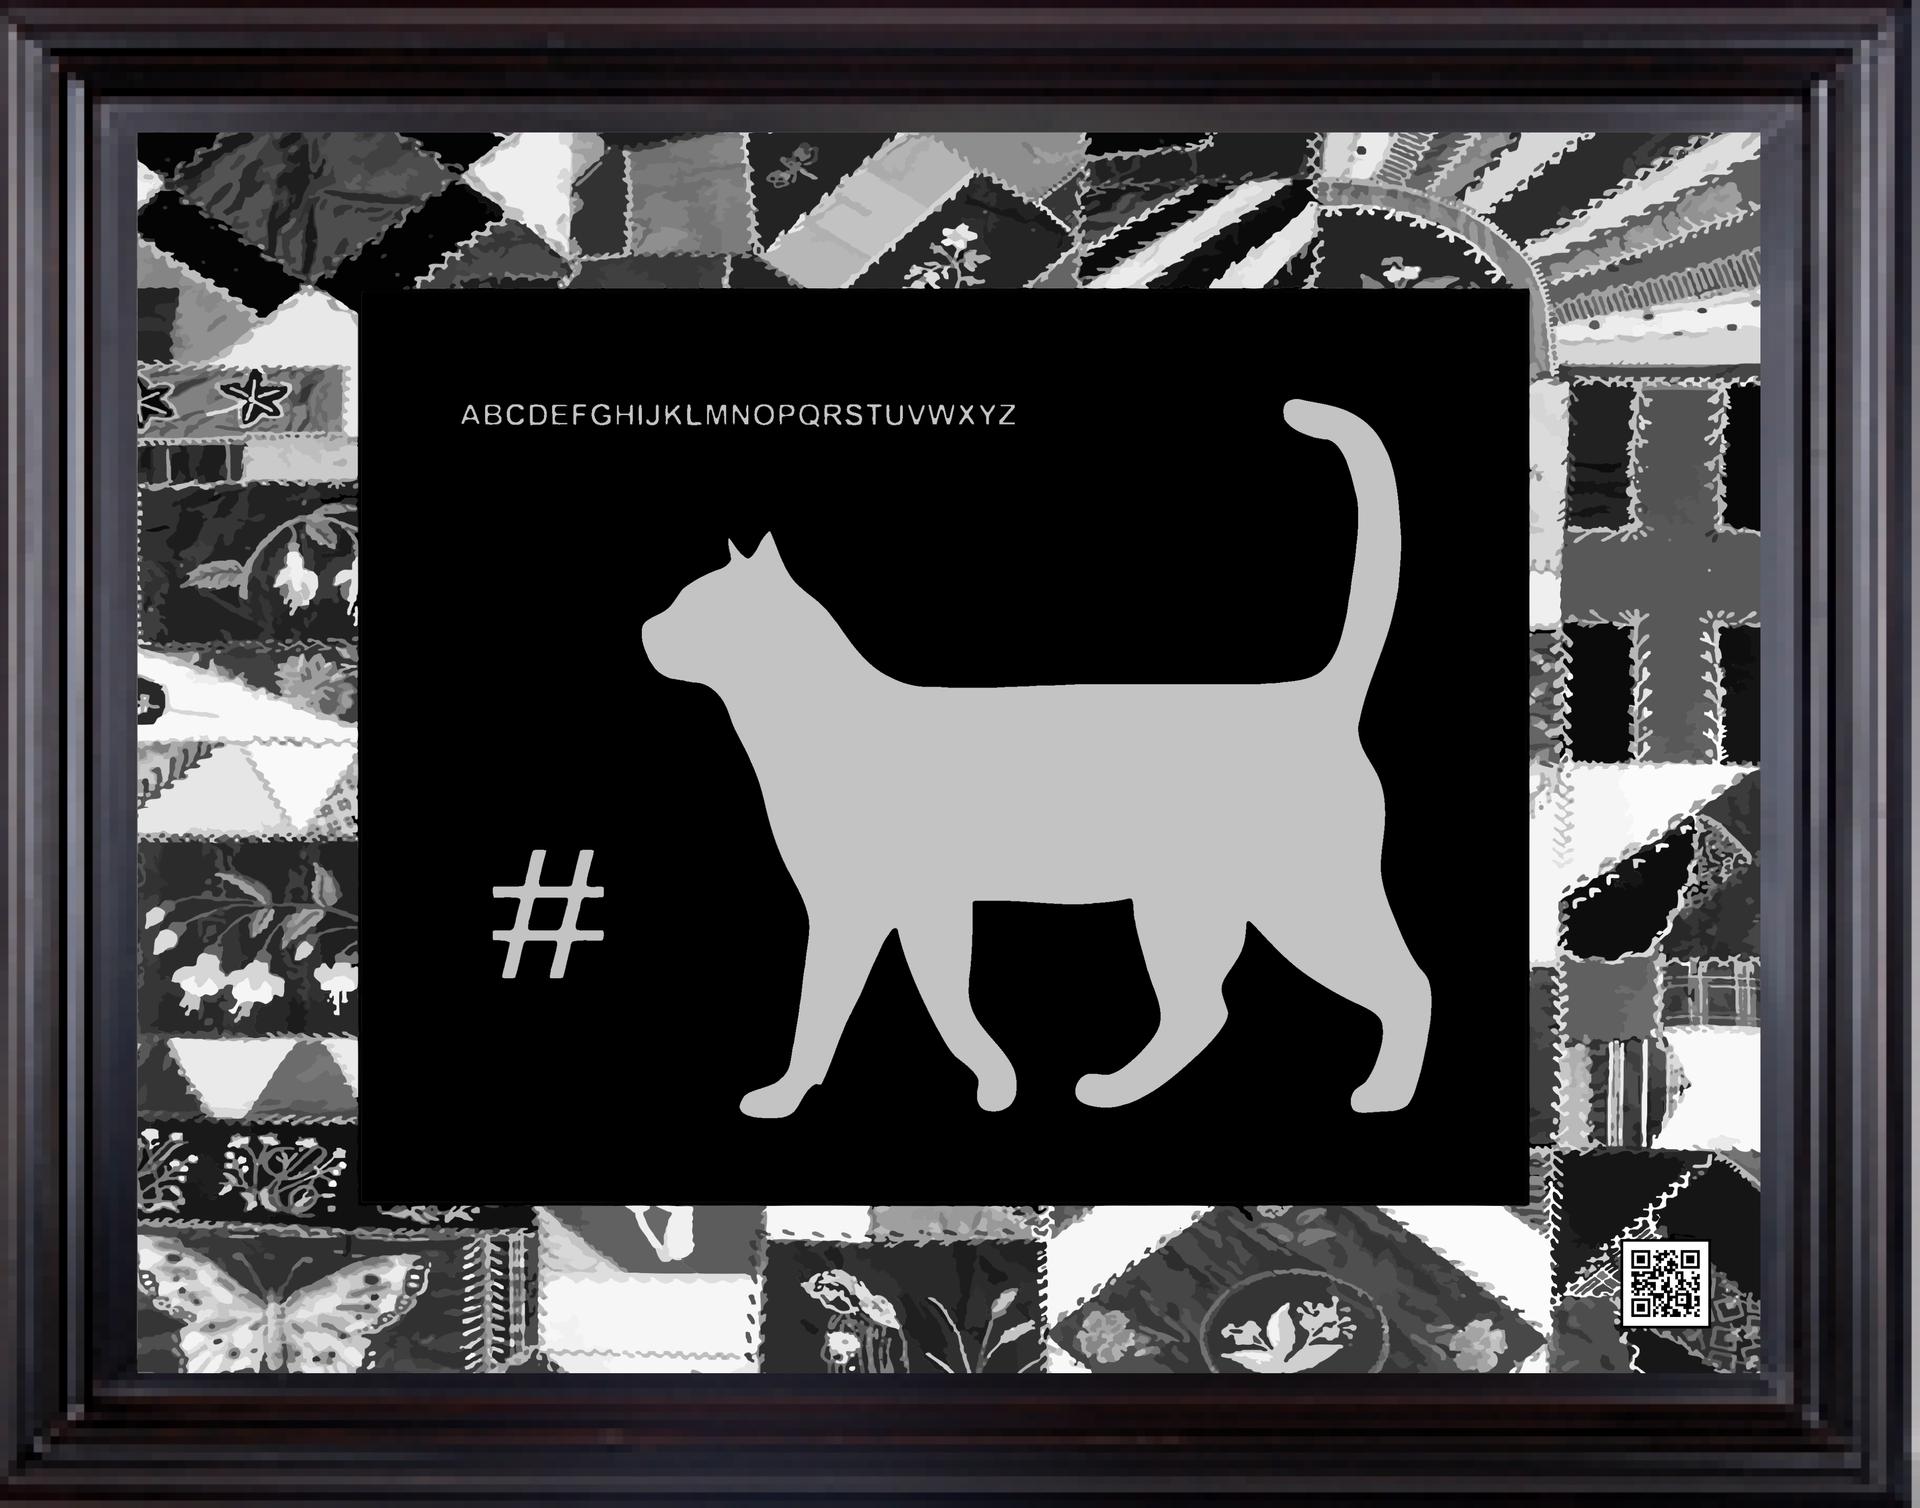 framedcatgray16x20bw1920.png